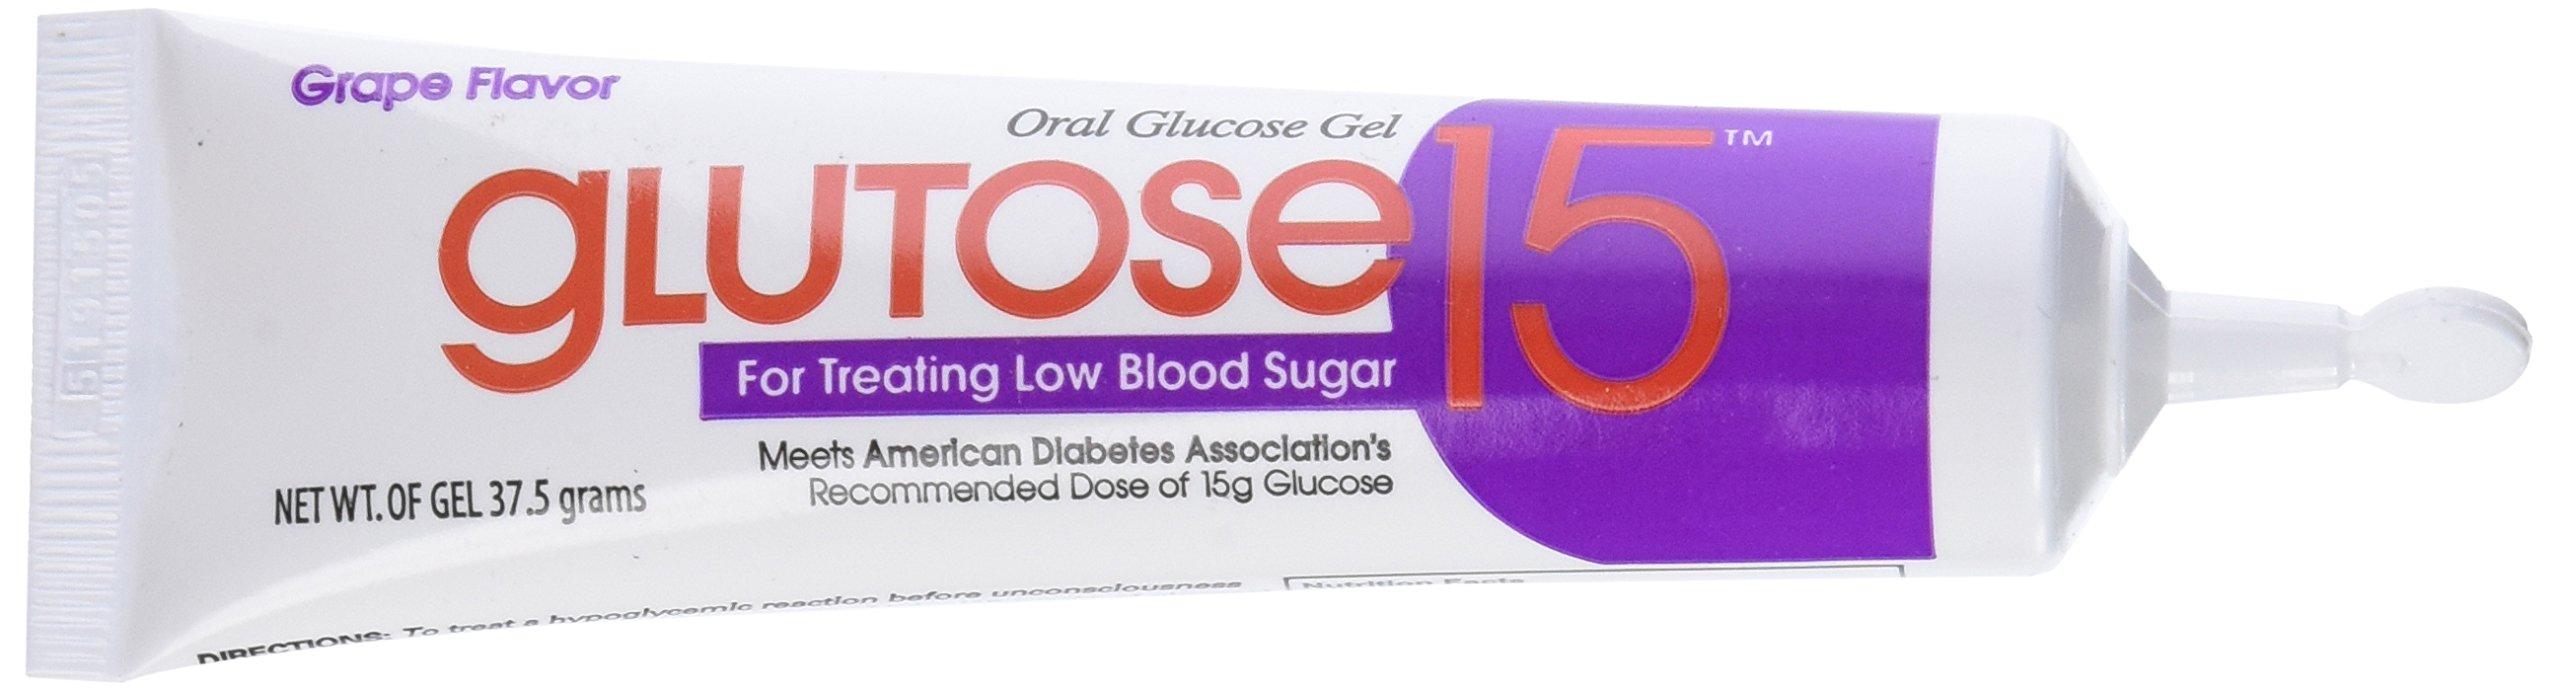 PADDOCK LABORATORIES Glucose Gel Tube, Grape, 37.5g, 3 Count